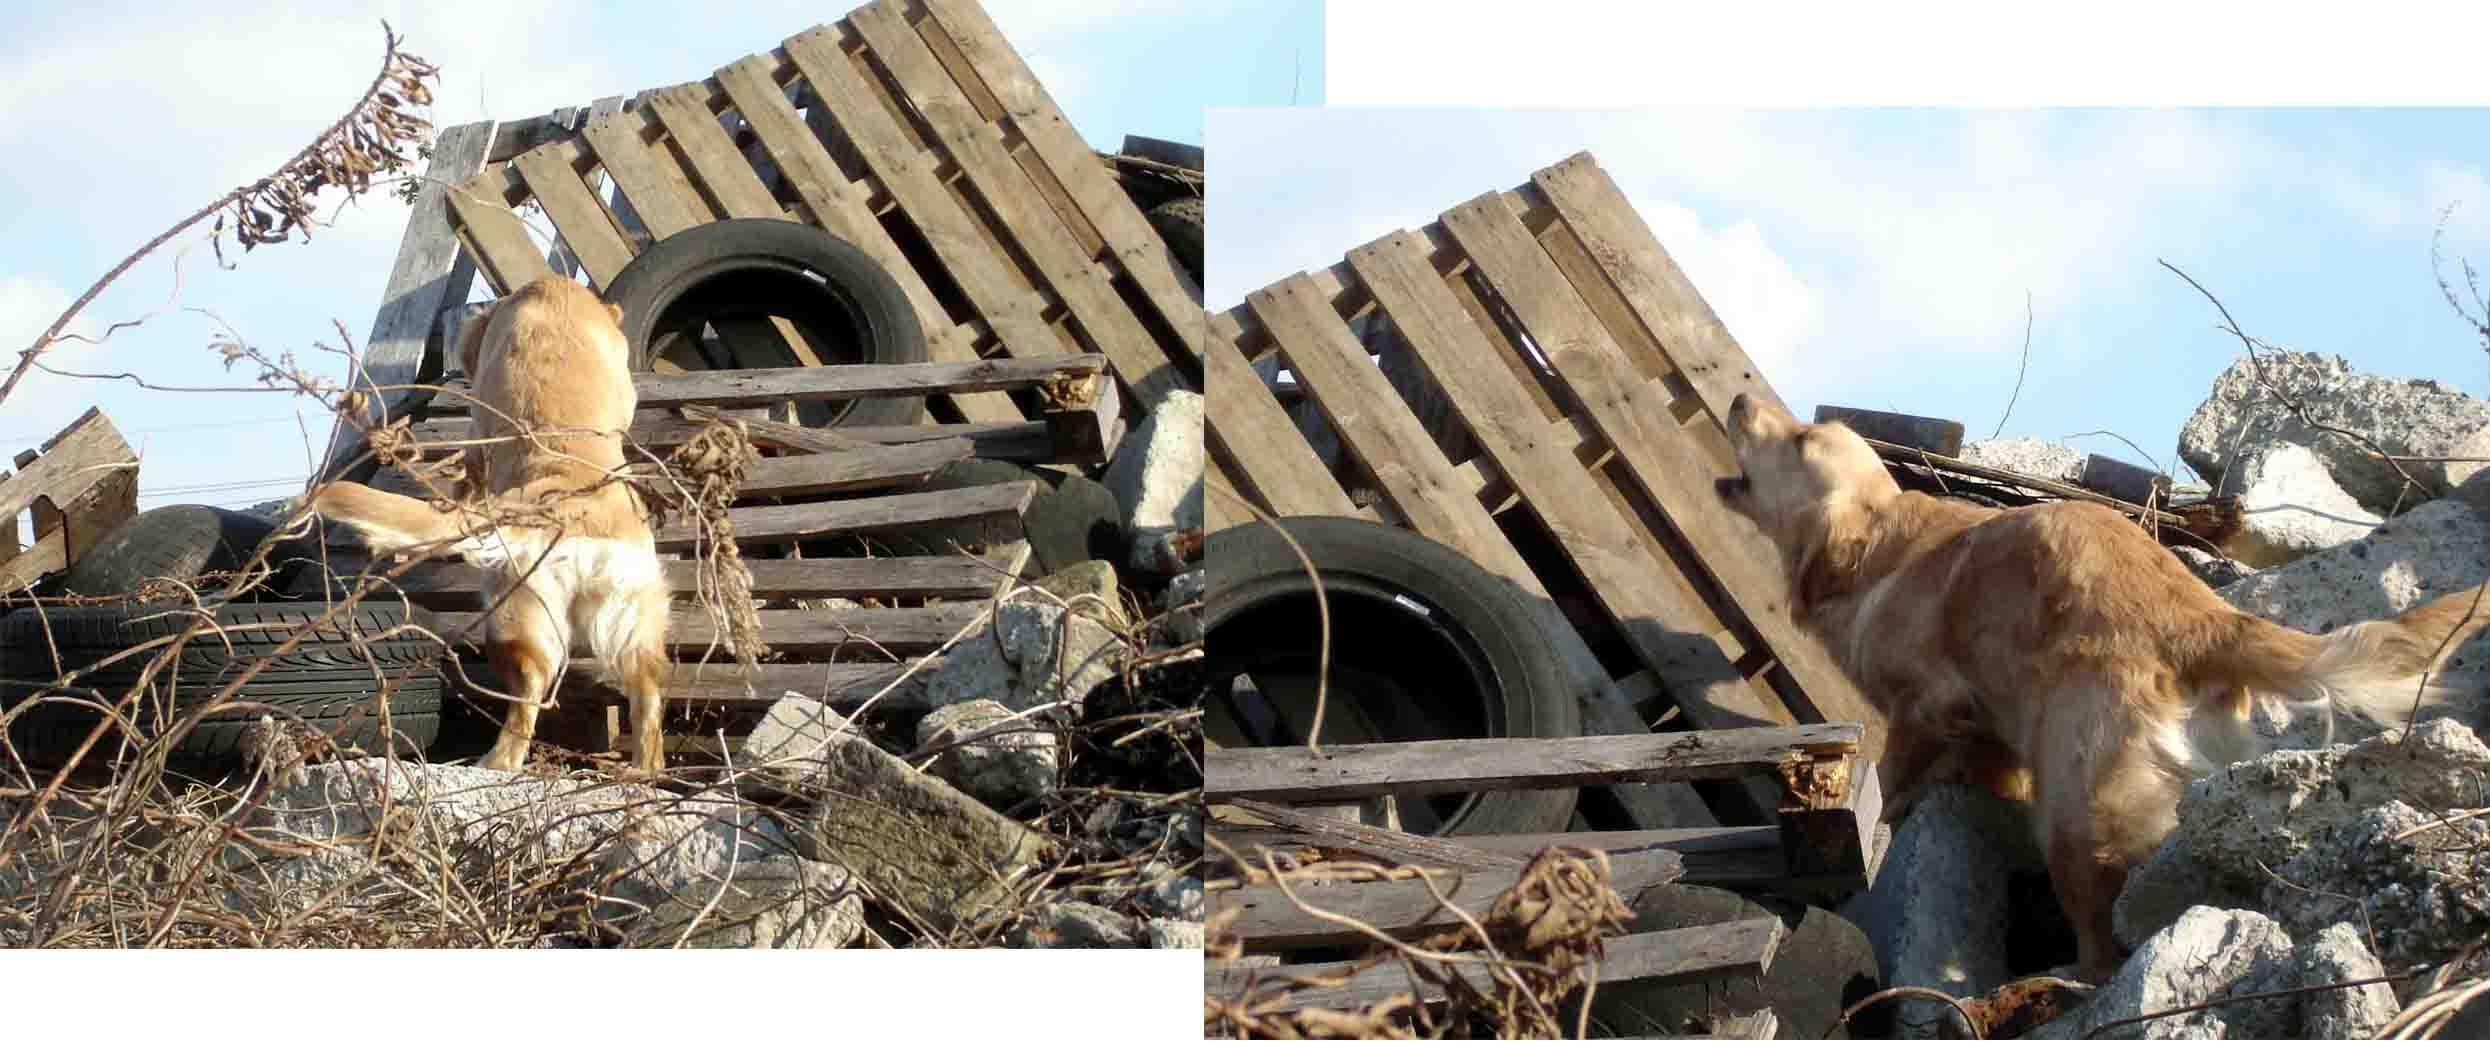 Gモニカの瓦礫捜索訓練